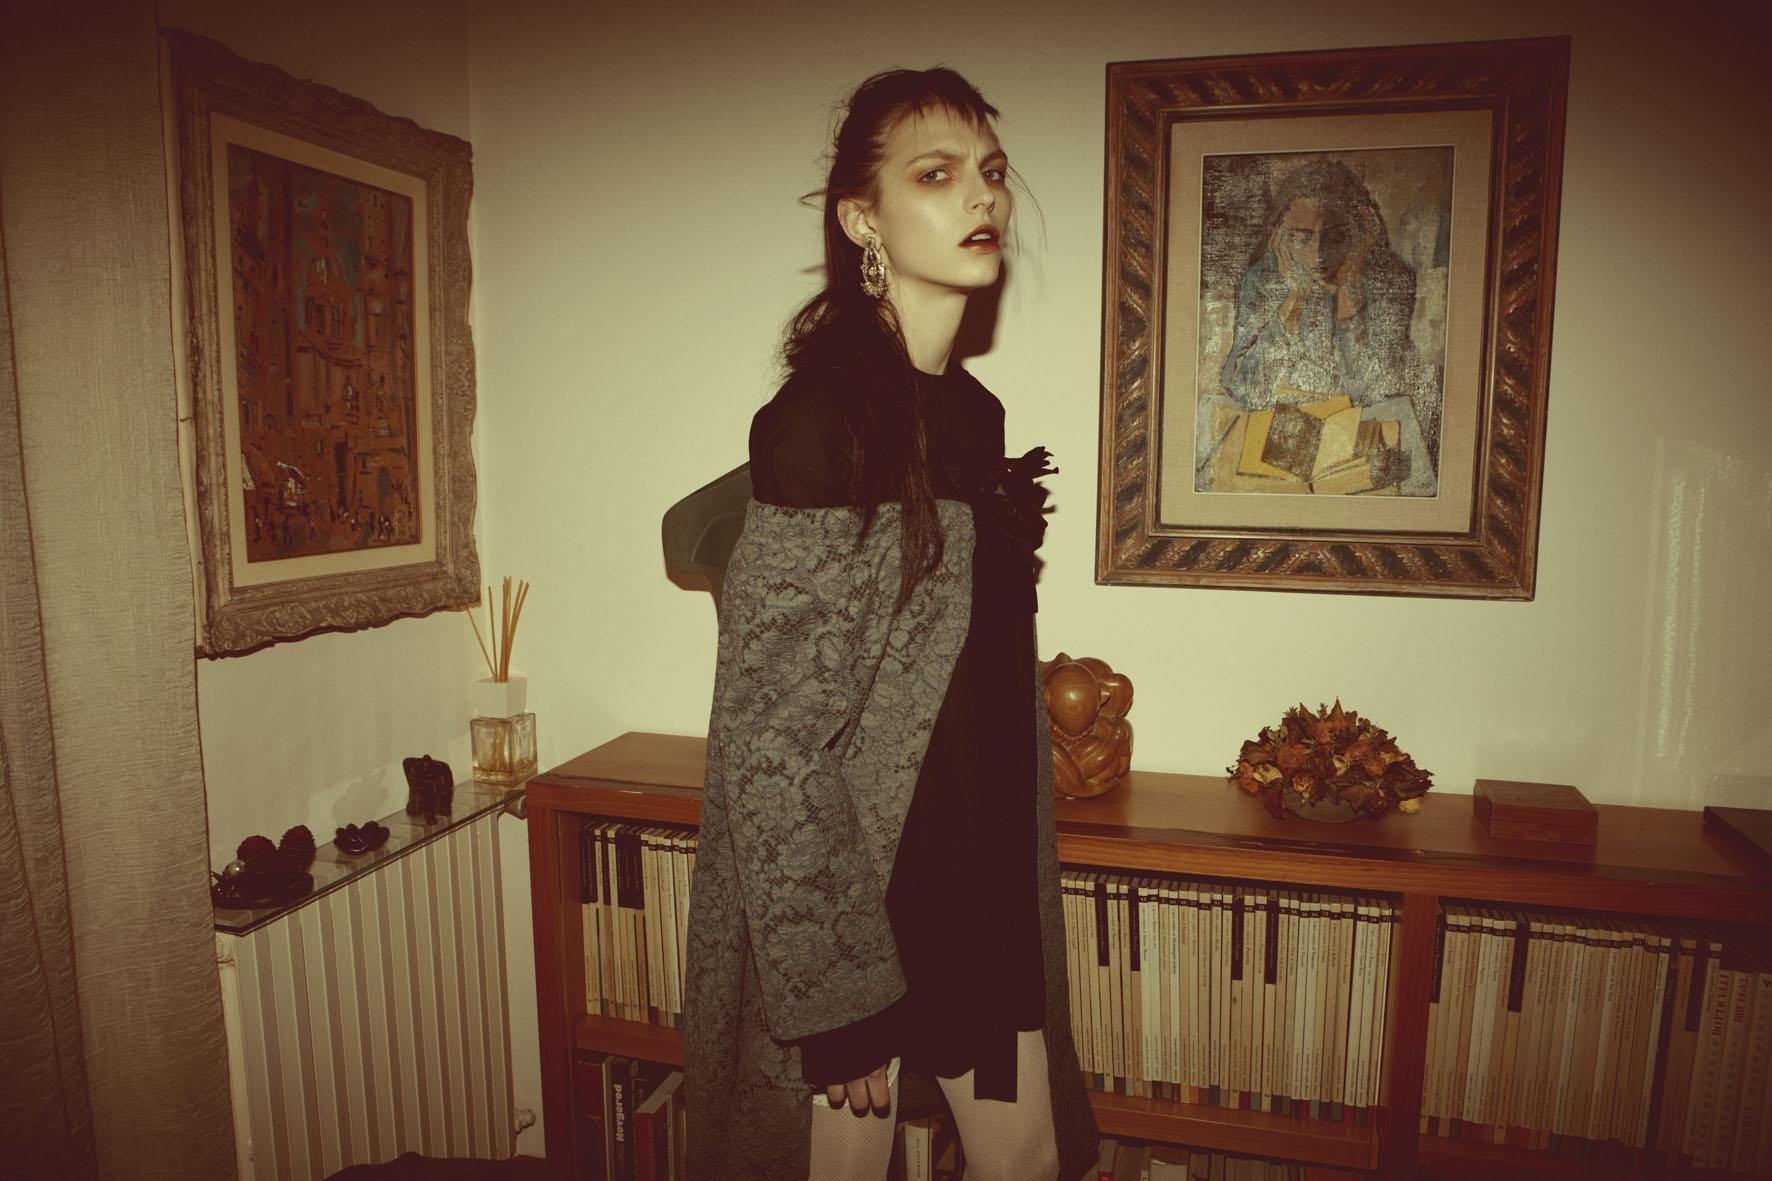 Karlina Caune by Alessio Bolzoni (Miu Miu - Lurve #6 Winter 2012-2013) 6.jpg